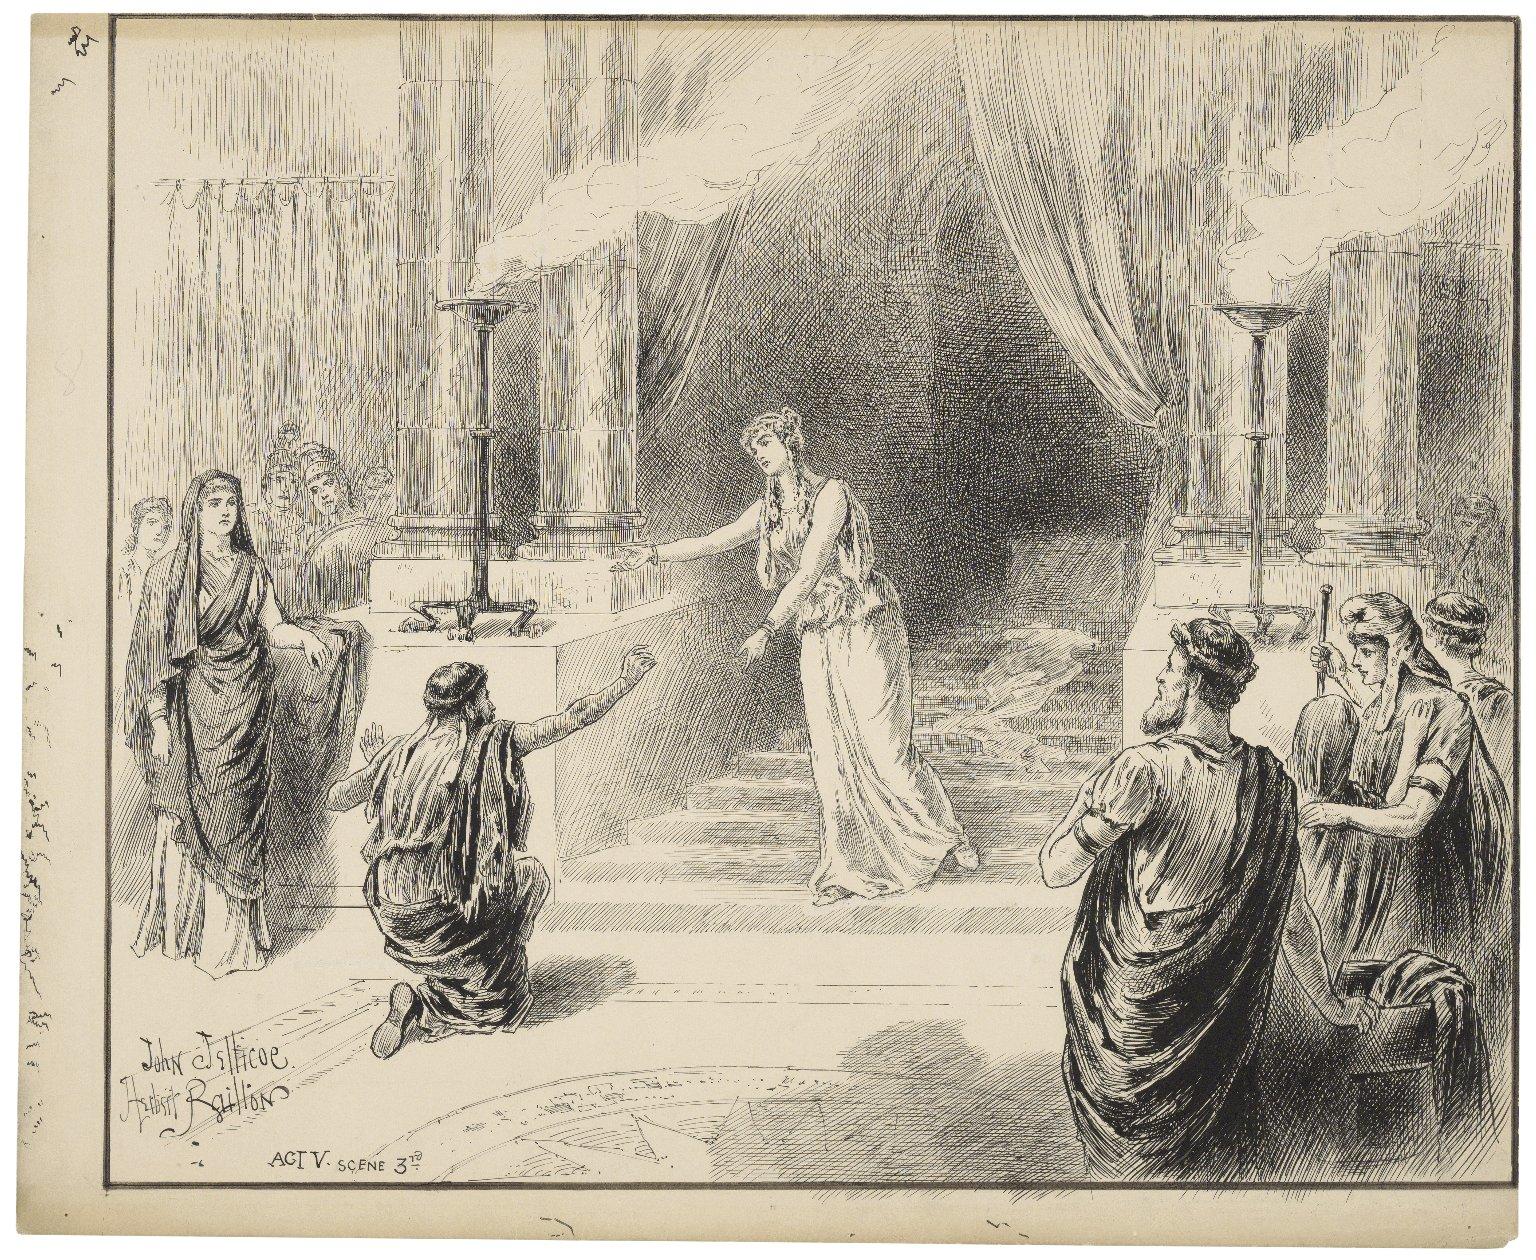 [Winter's tale, V, 3] [graphic] / John Jellicoe ; Herbert Railton.